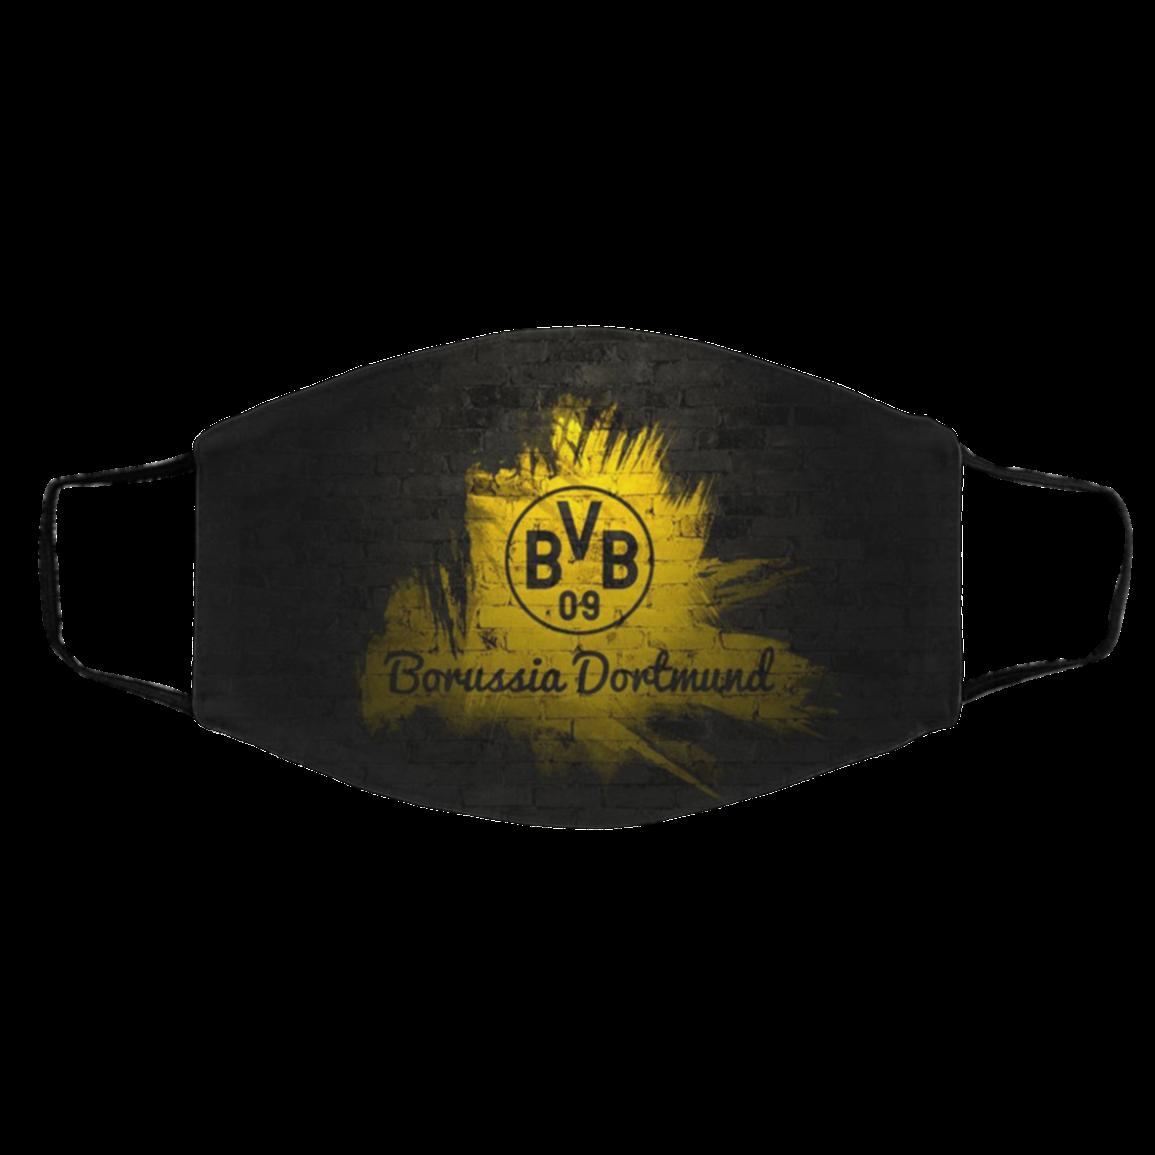 Face Mask Borussia Dortmund Reusable Cotton Masks